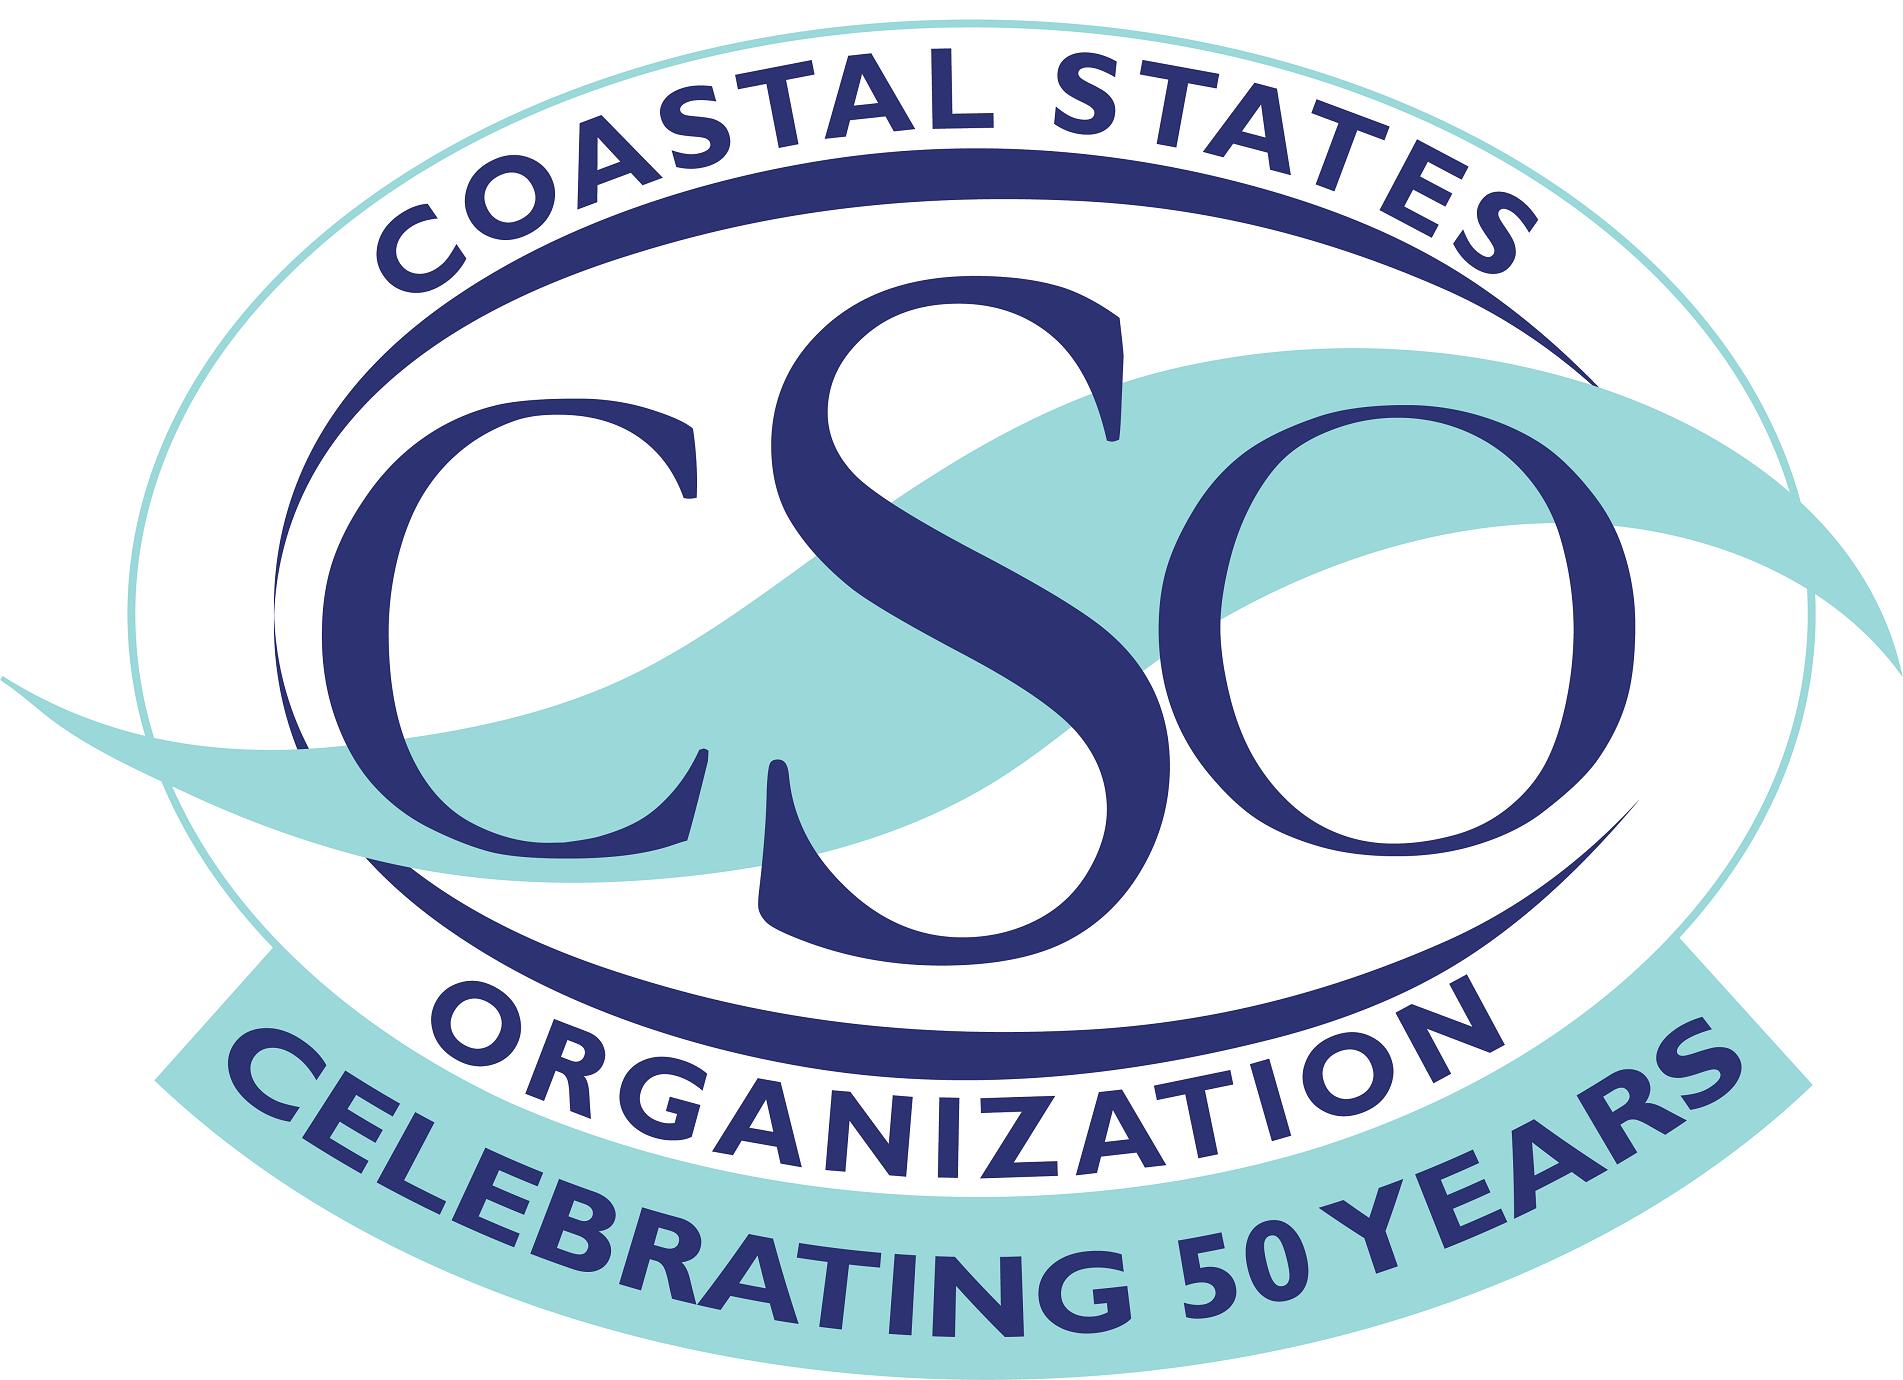 Coastal States